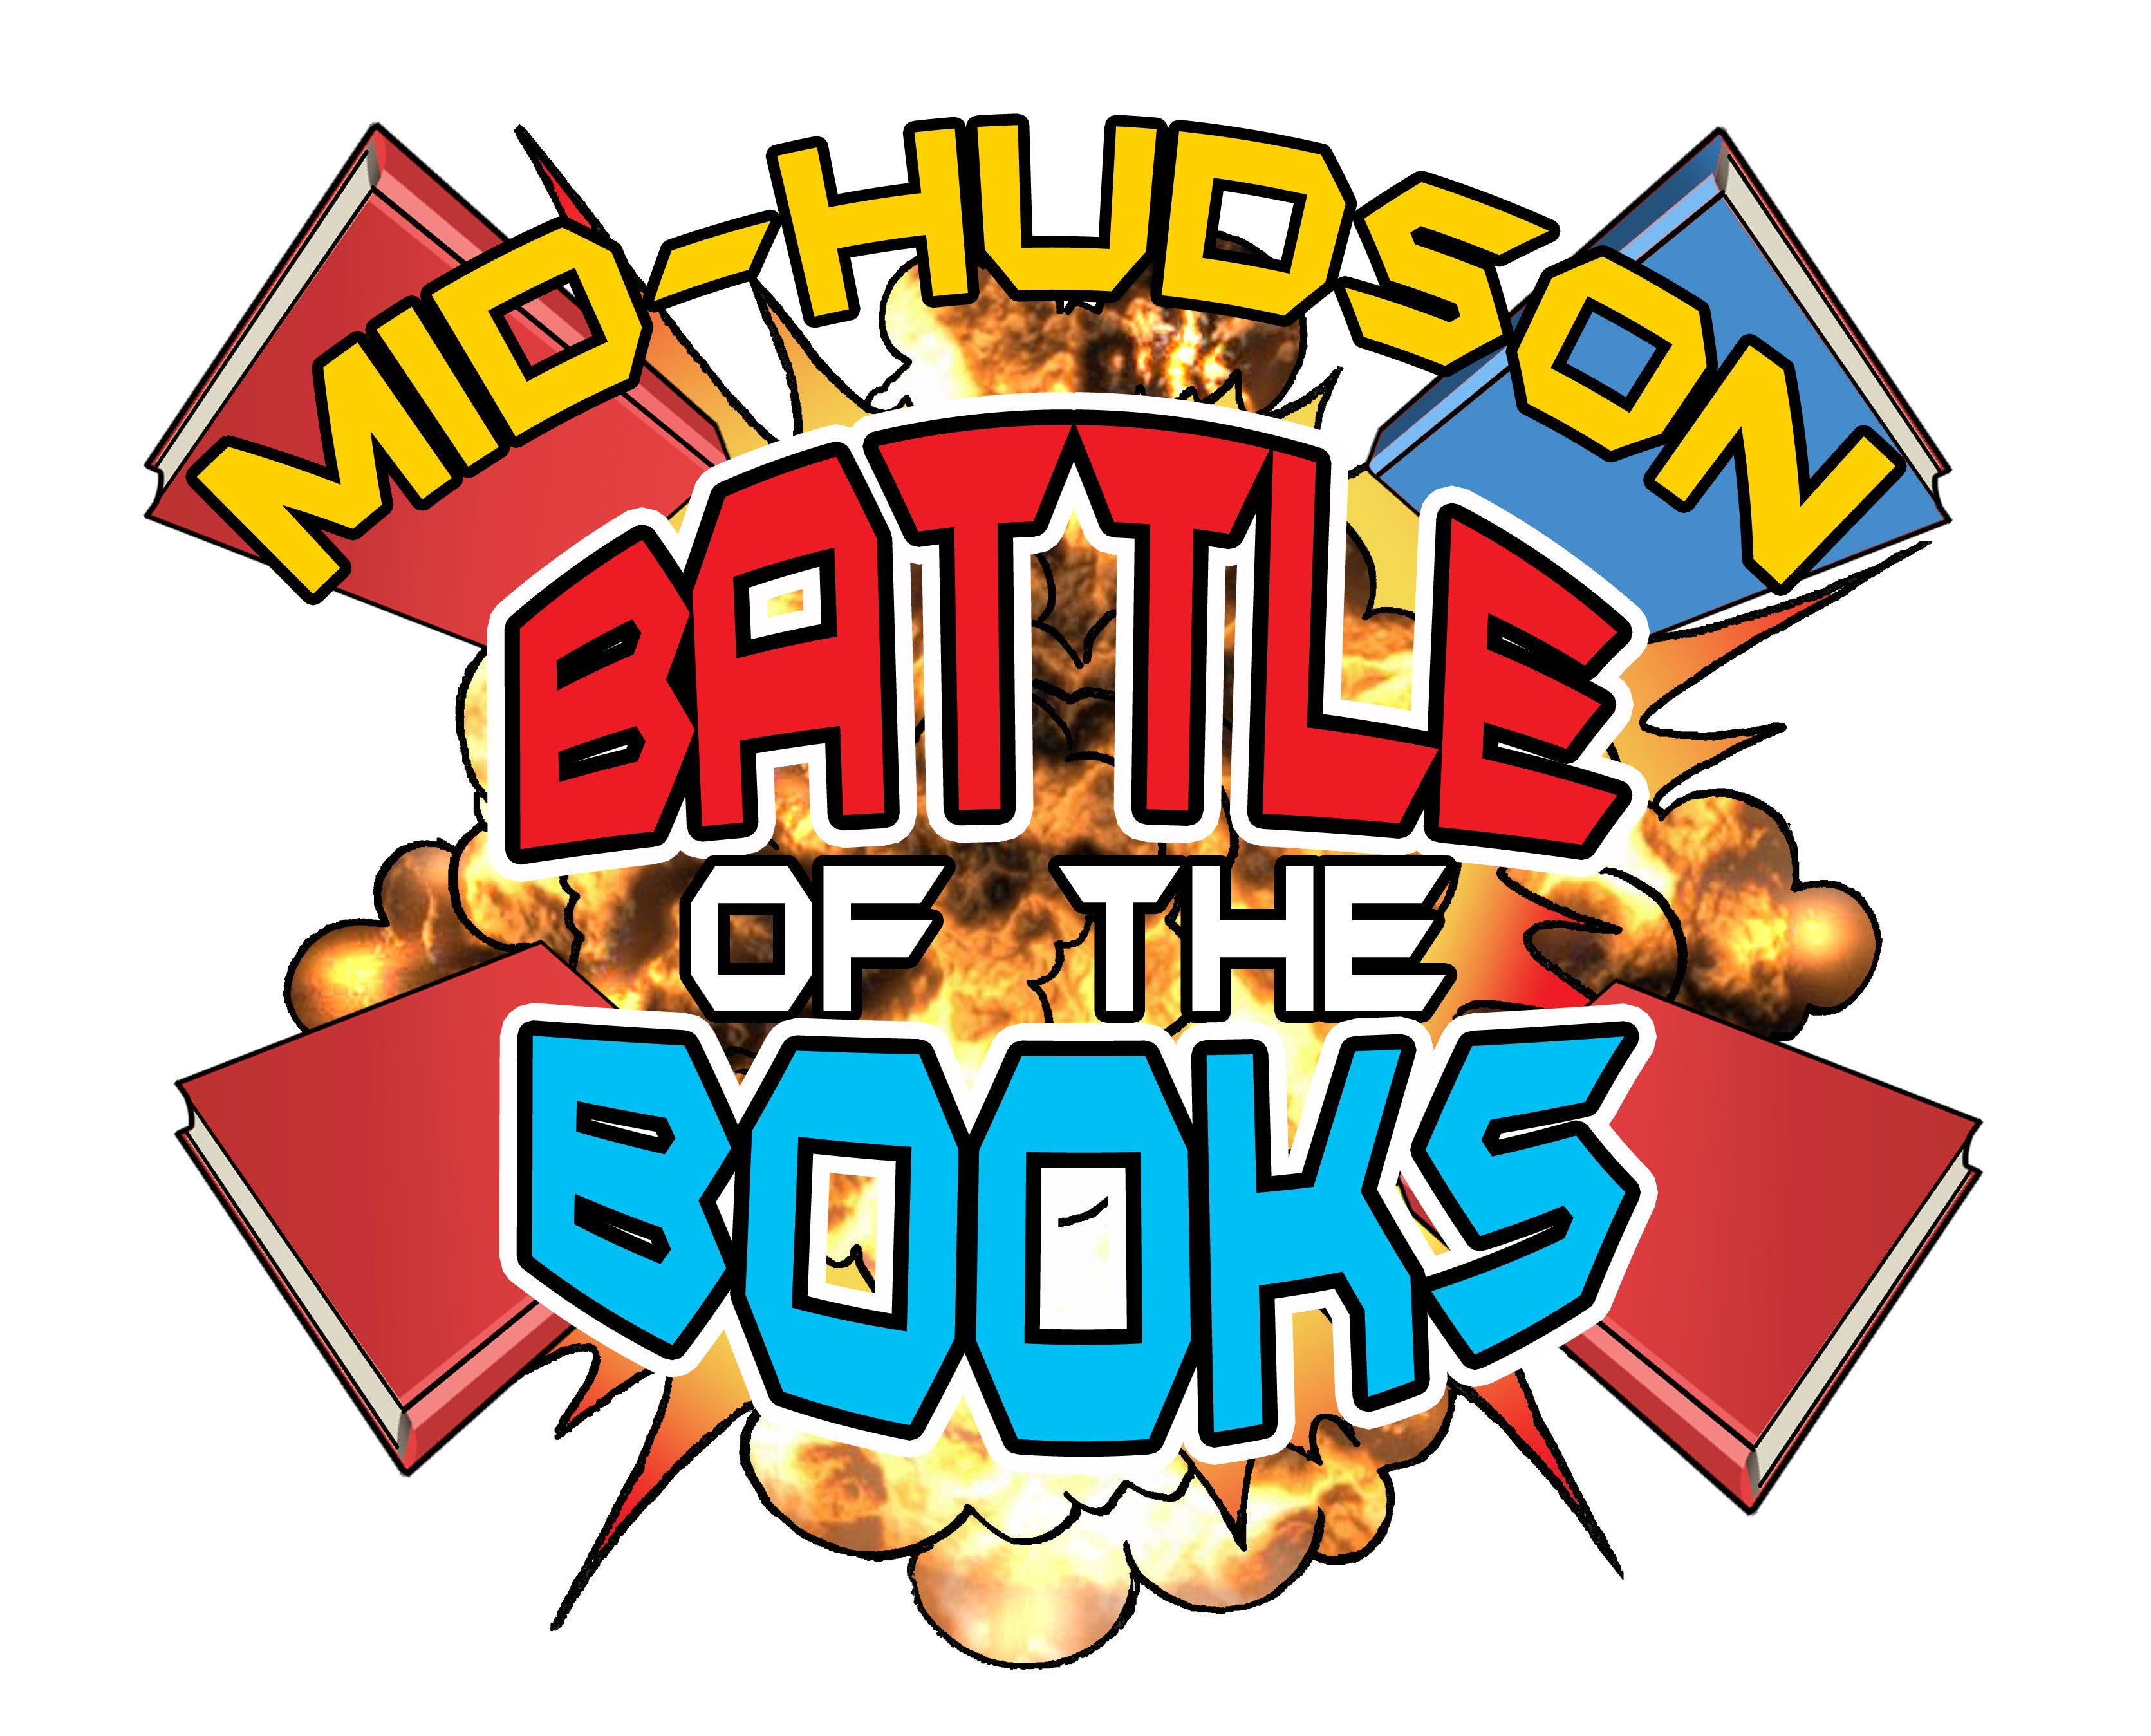 Mid-Hudson Battle of the Books